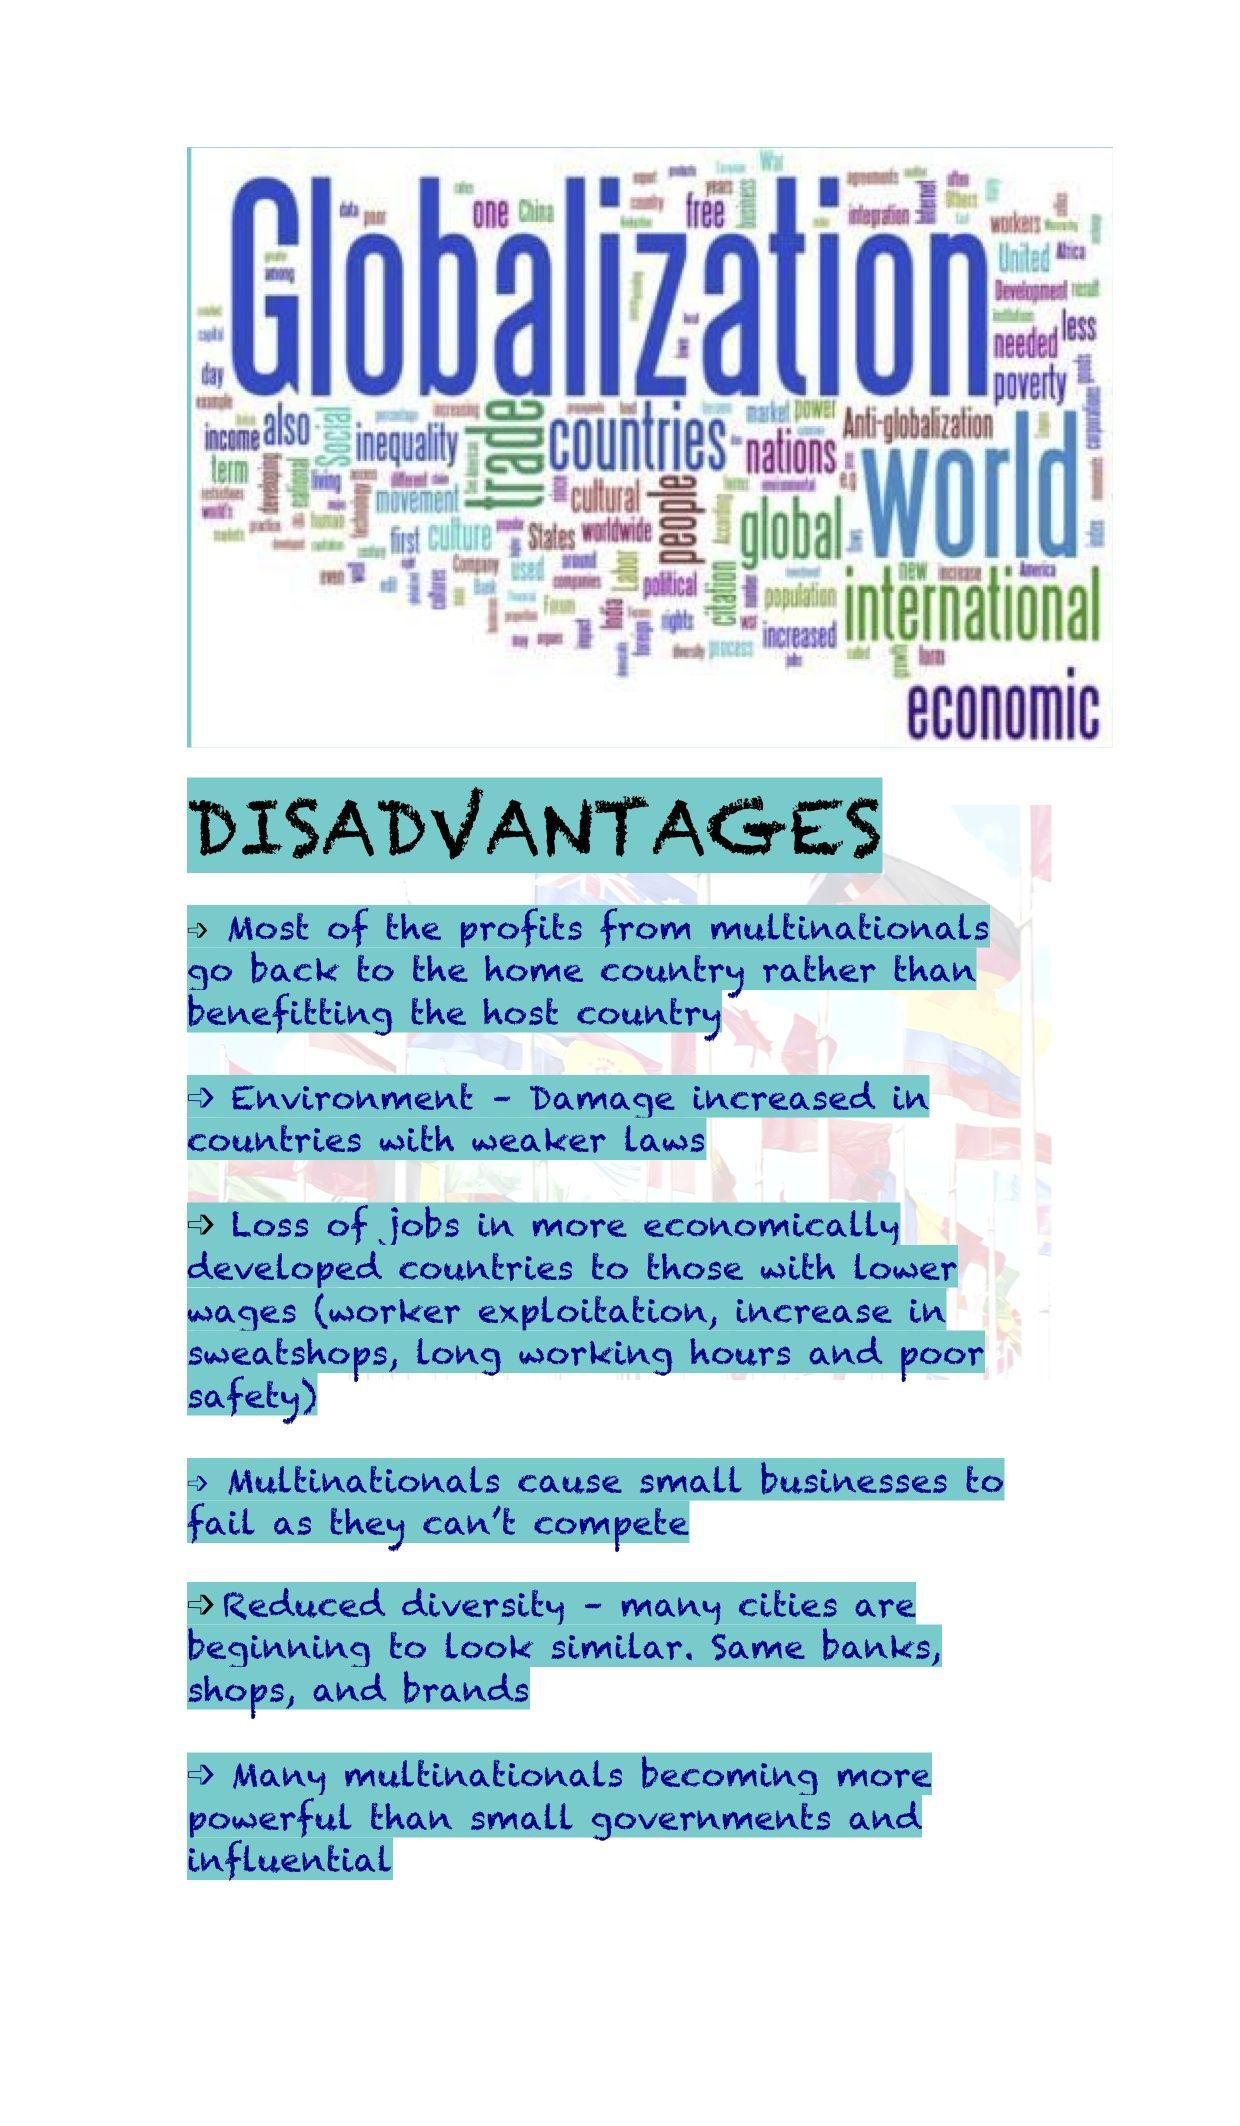 Globalisation_DisadvantagesII | Education | Pinterest | Social ...